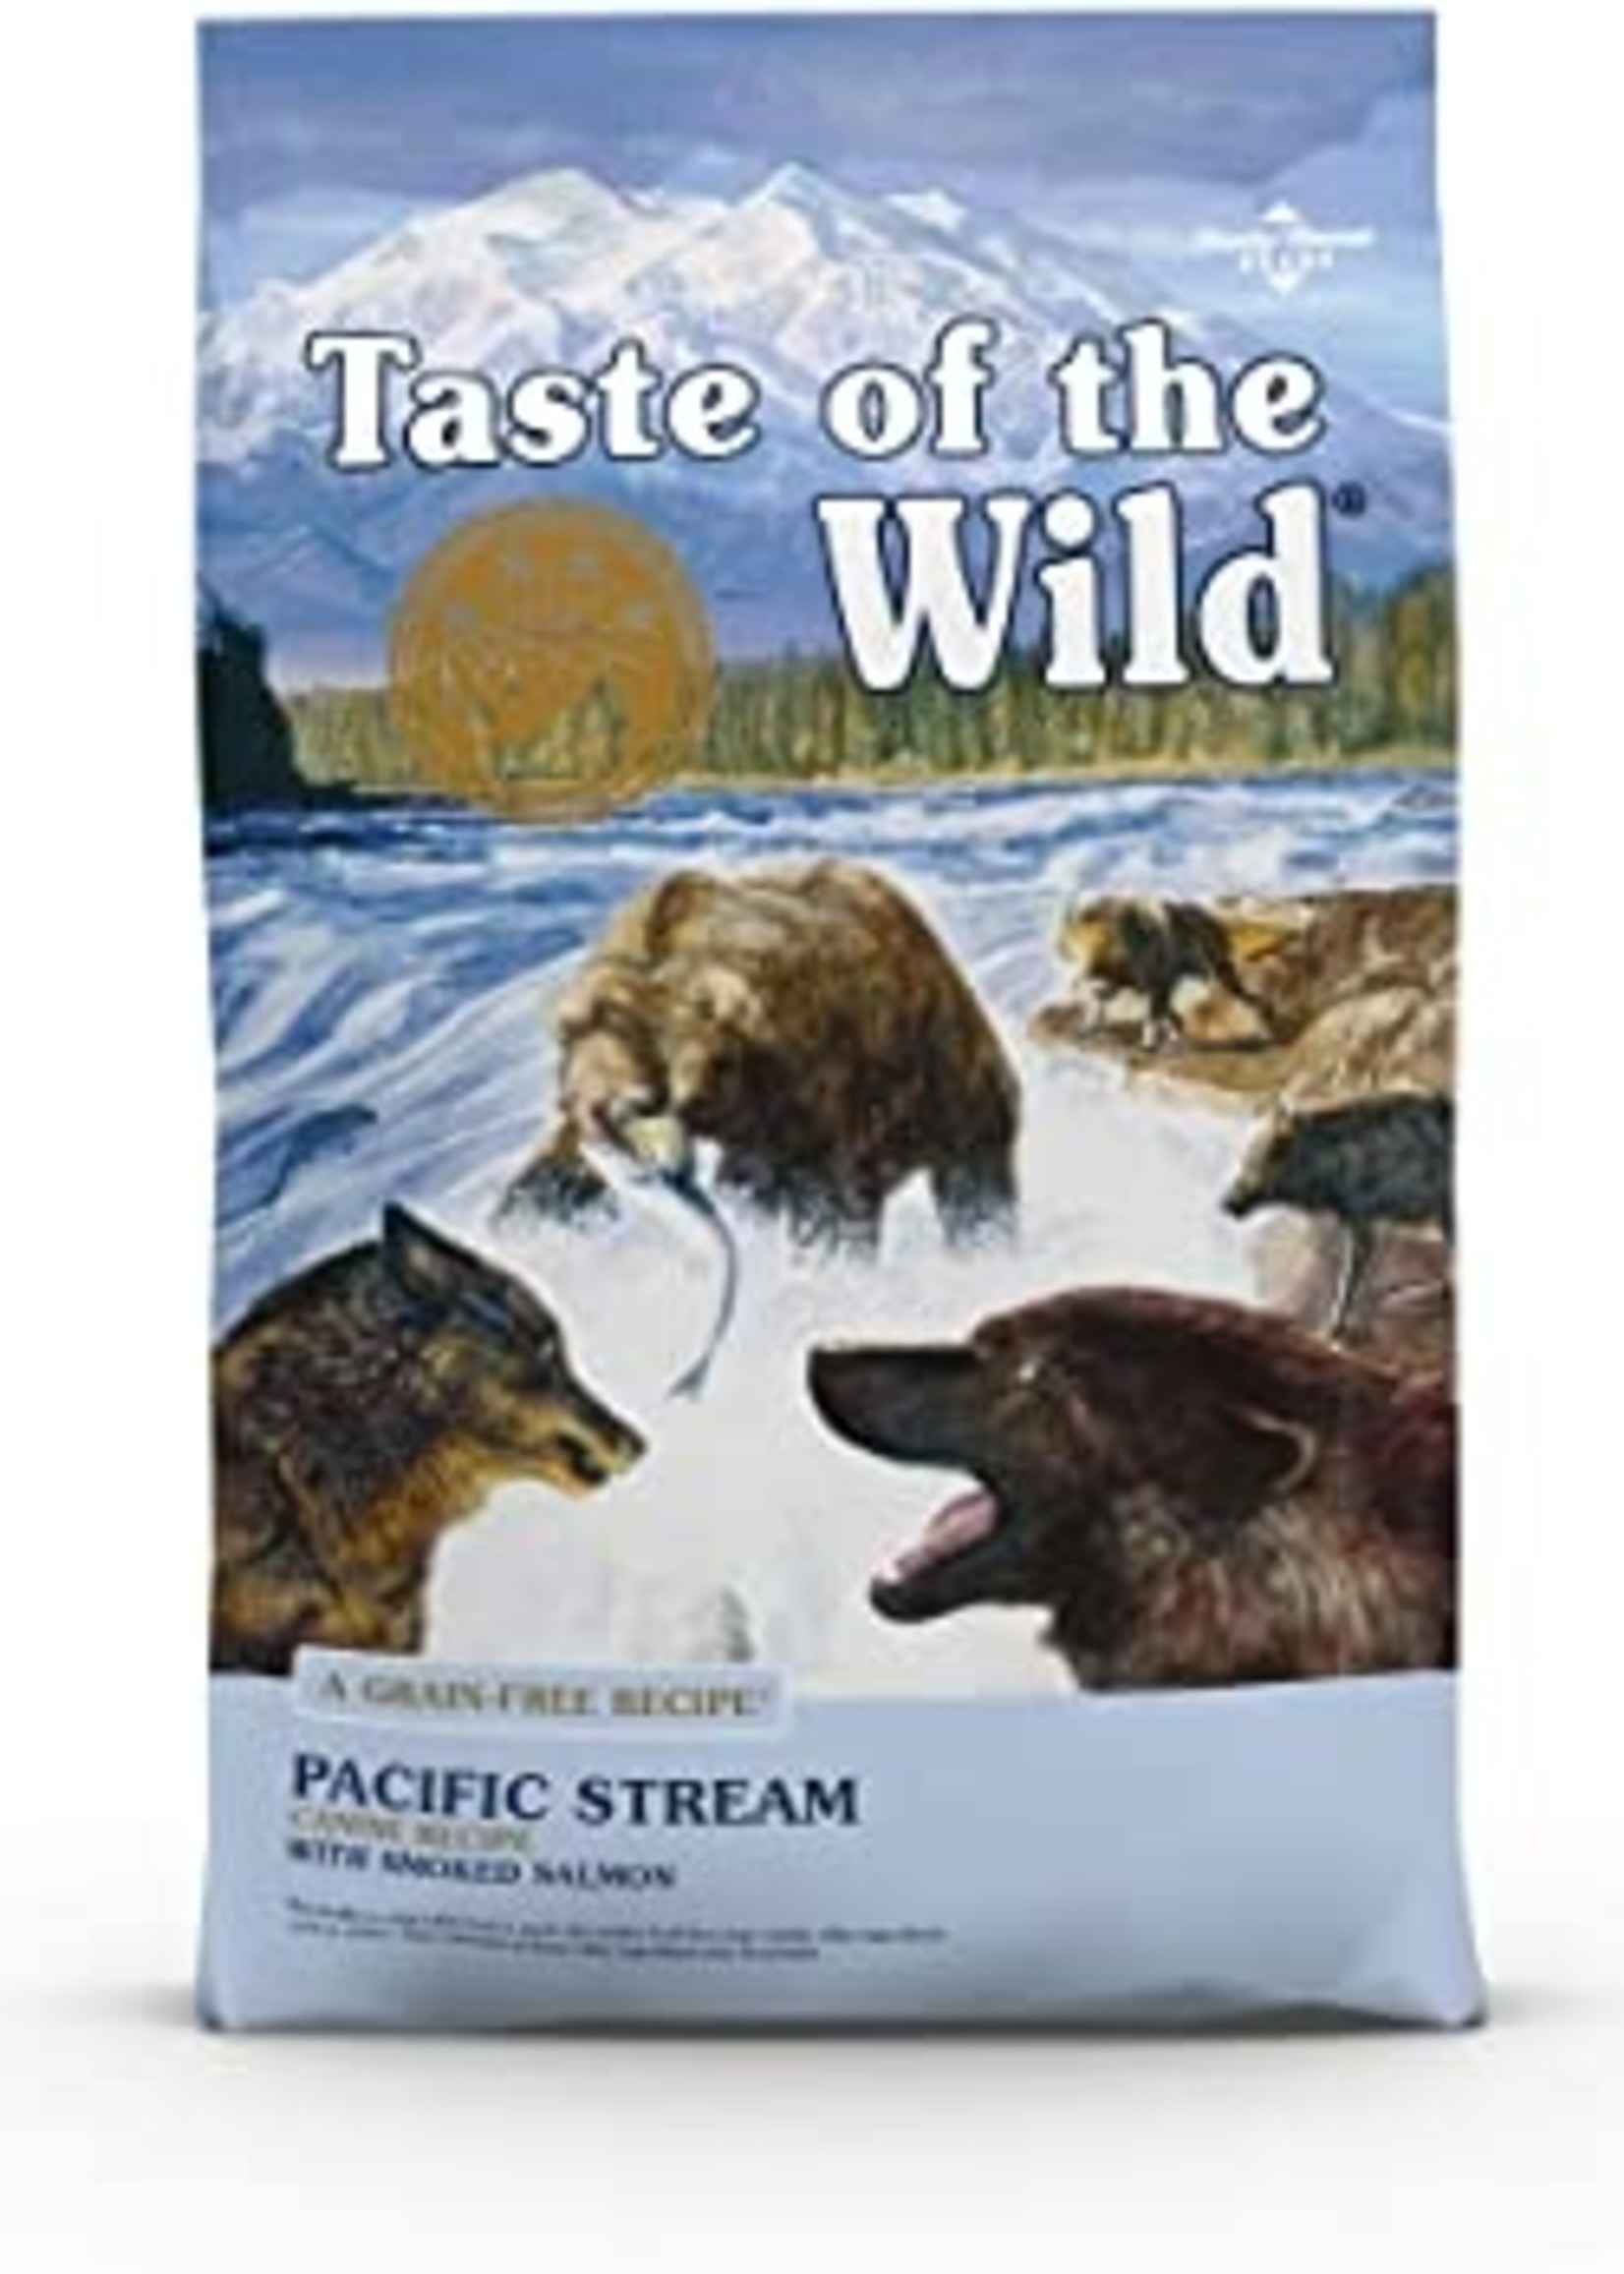 Taste of the Wild® TASTE OF THE WILD GF PACIFIC STREAM RECIPE w/SMOKED SALMON 28lbs